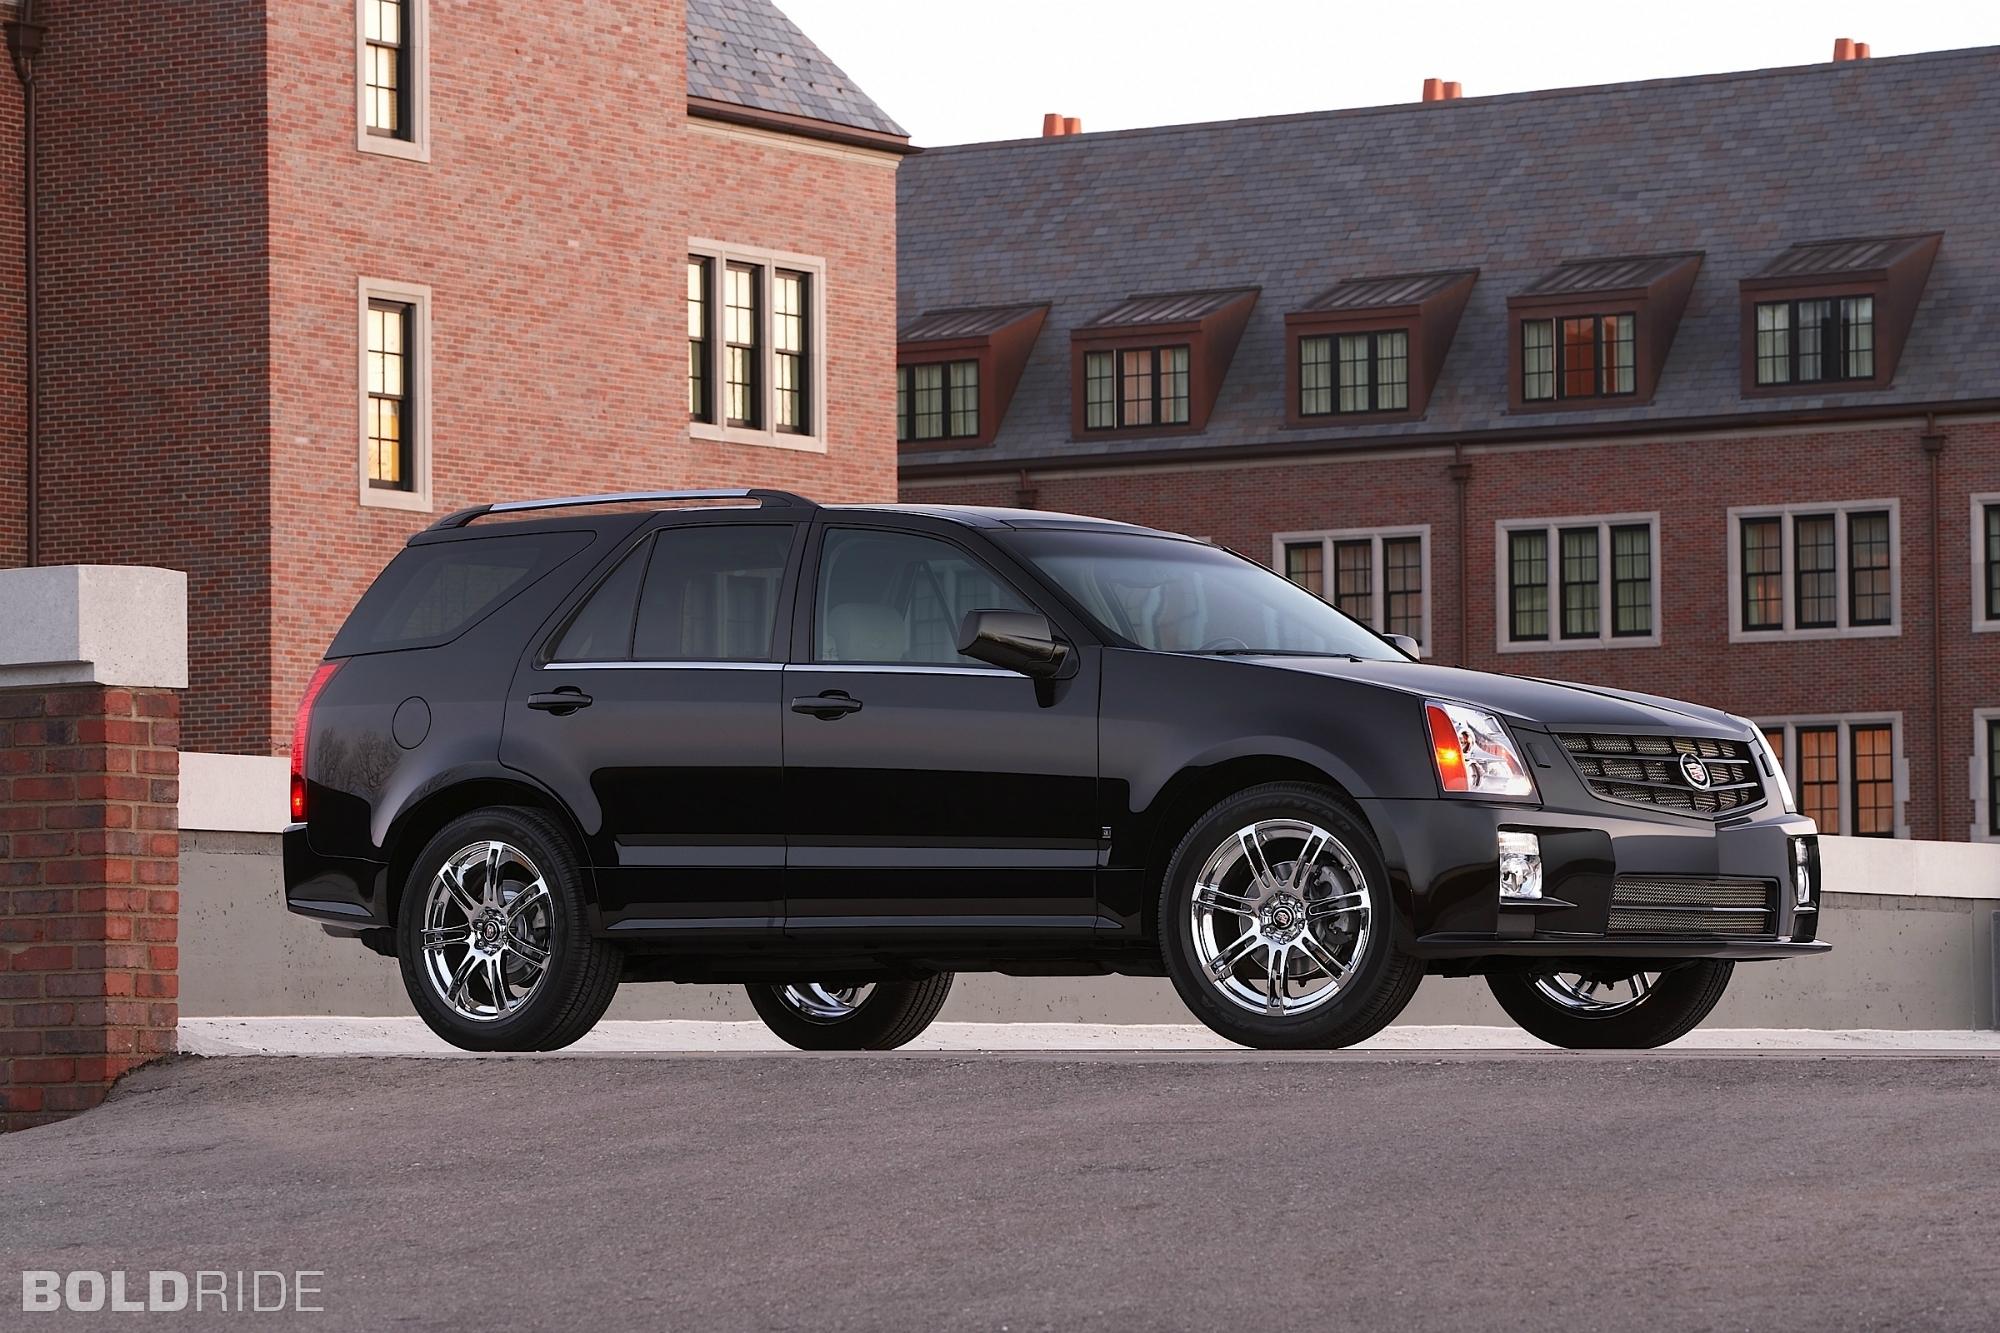 2009 Cadillac SRX - Information and photos - ZombieDrive